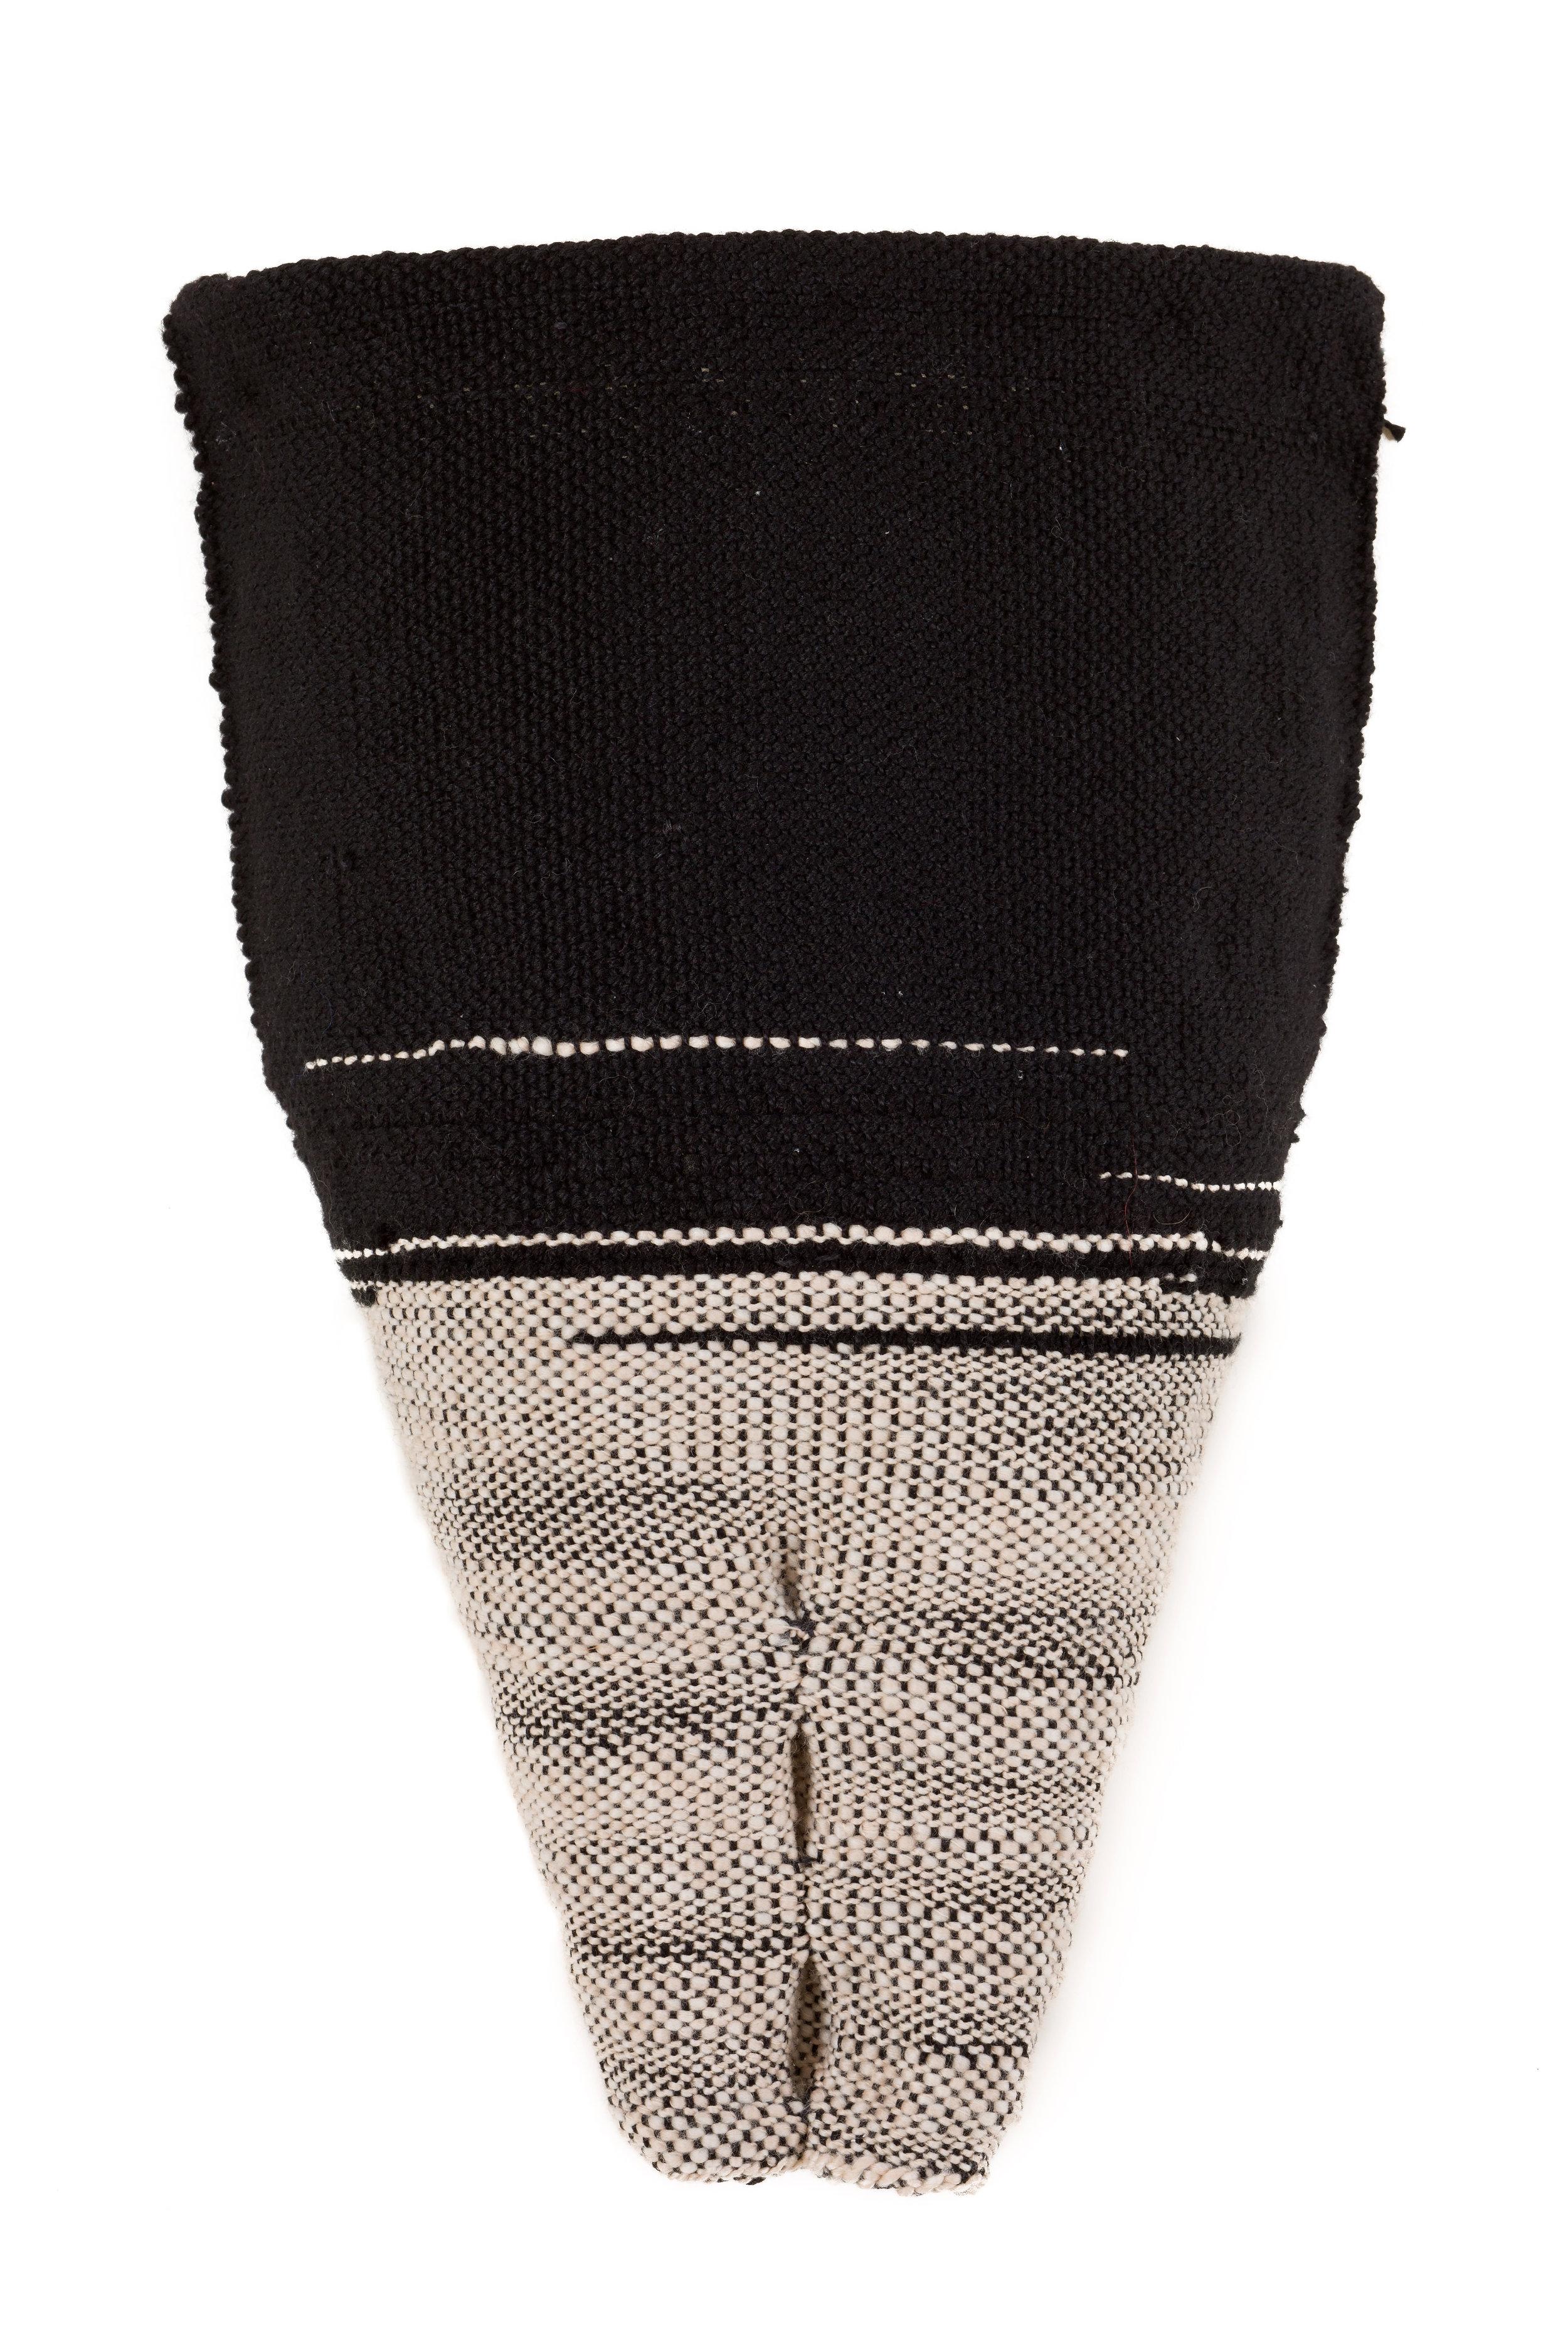 Sylvia Vander Sluis,  I Was a Child When (Pelvis series) , Handwoven wool, 17x11x4